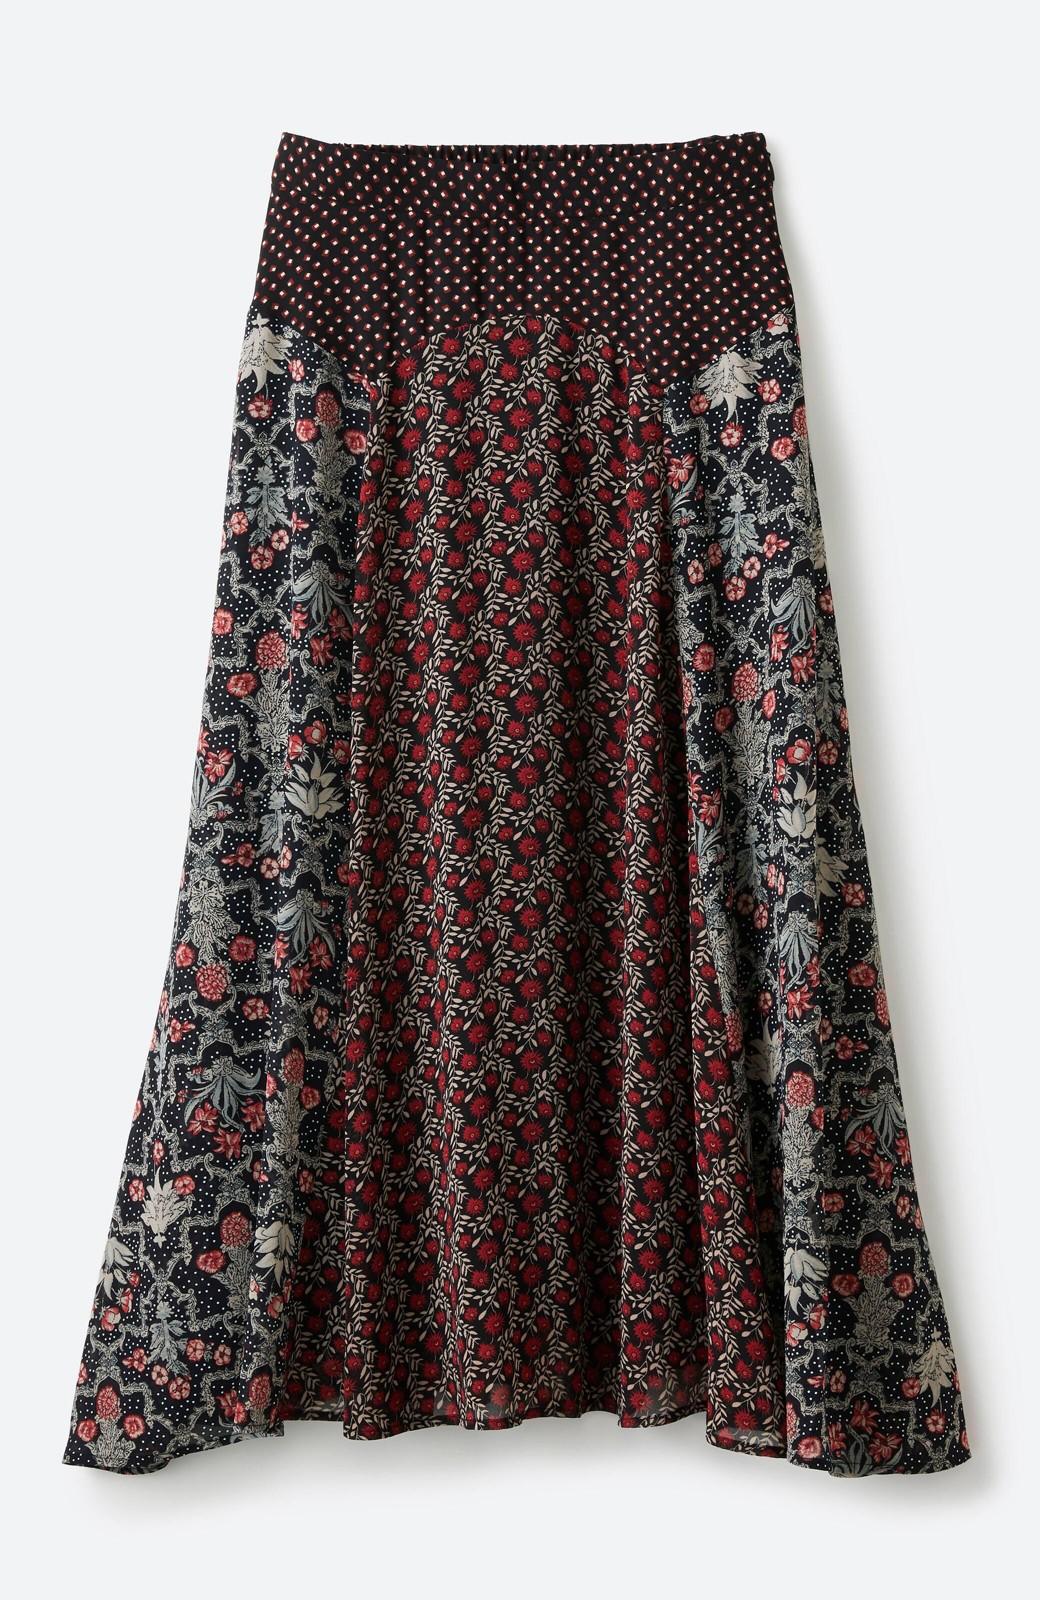 haco! 【洗濯機洗いOK】シンプルなトップスに合わせるだけでかわいくなれる MIX柄スカート <ブラック系その他>の商品写真3